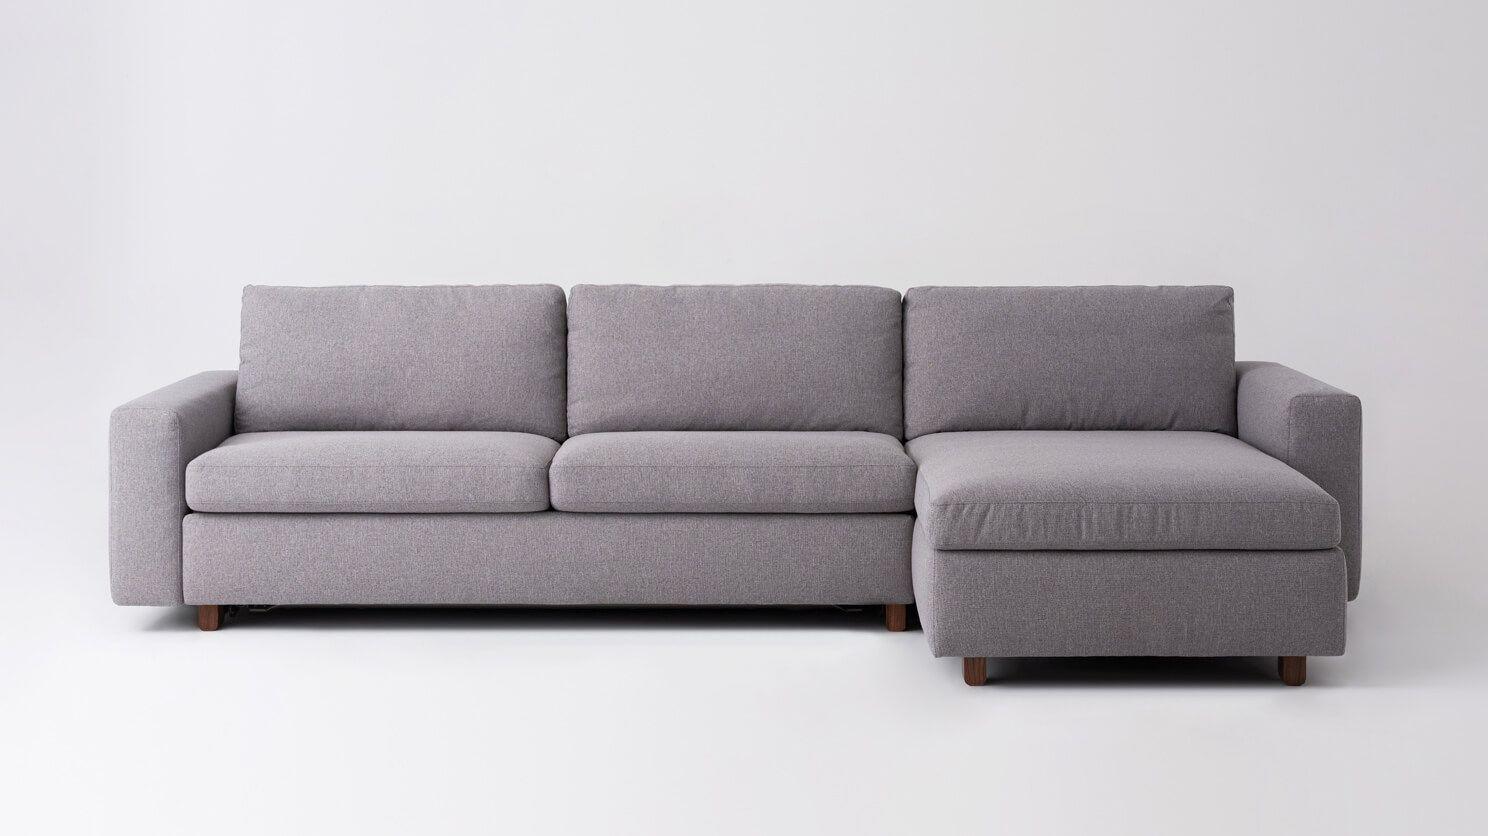 Reva 2 Piece Sectional Sleeper Sofa With Storage Chaise Fabric Eq3 Storage Chaise Sectional Sleeper Sofa Sectional